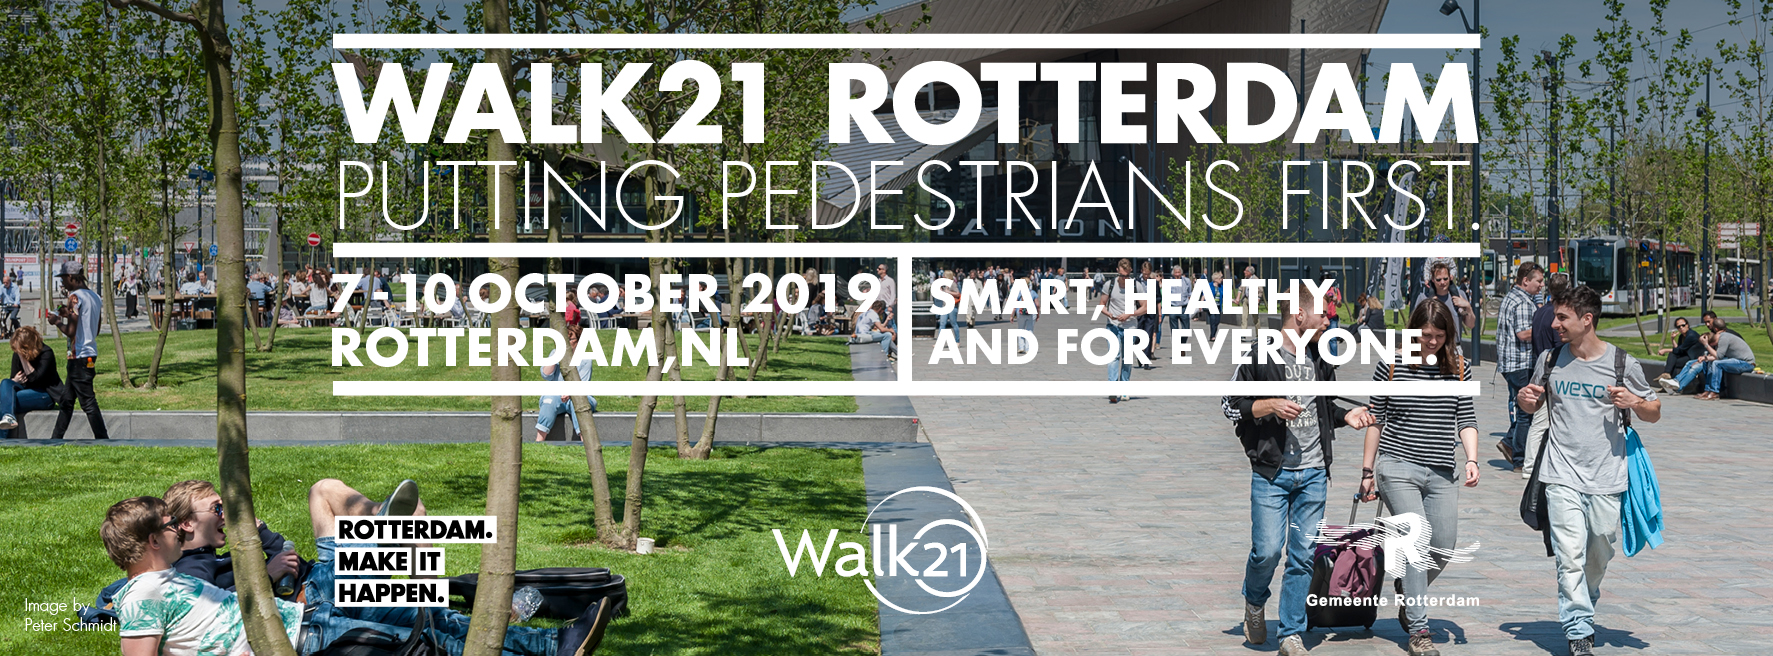 Walk21 Rotterdam 2019 - PUTTING PEDESTRIANS FIRST